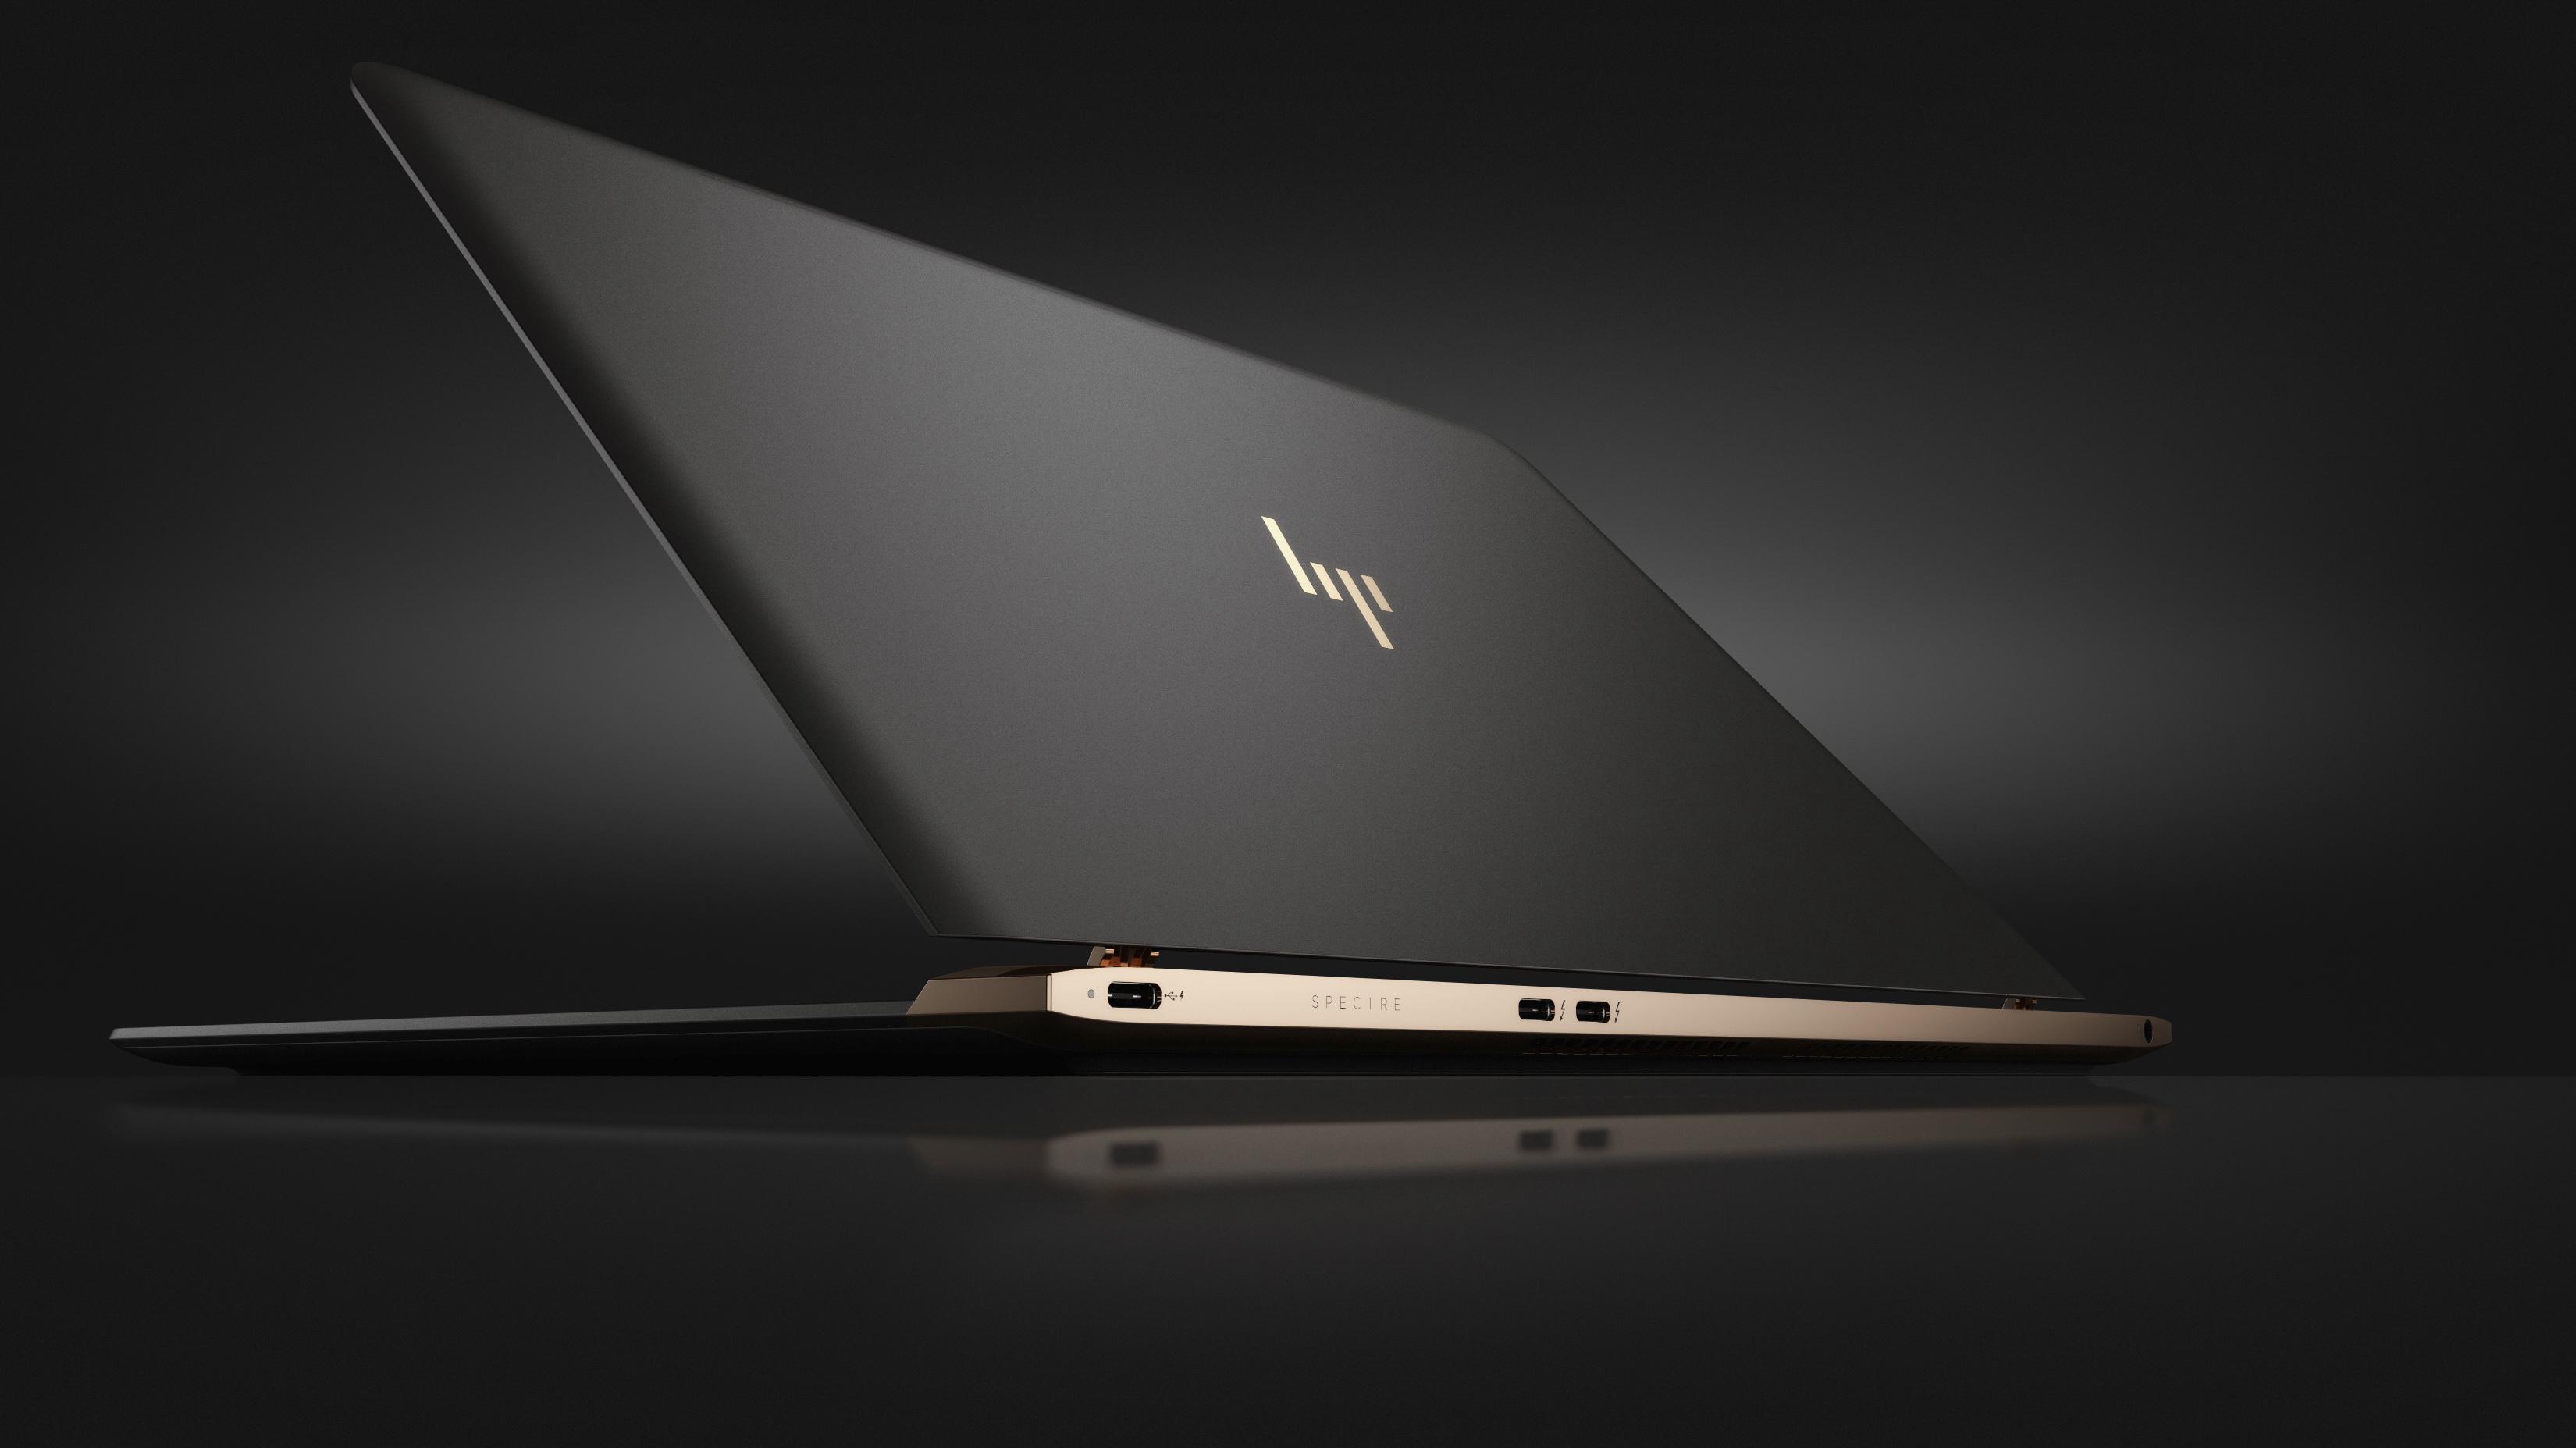 HP Spectre 13.3_Rear facing